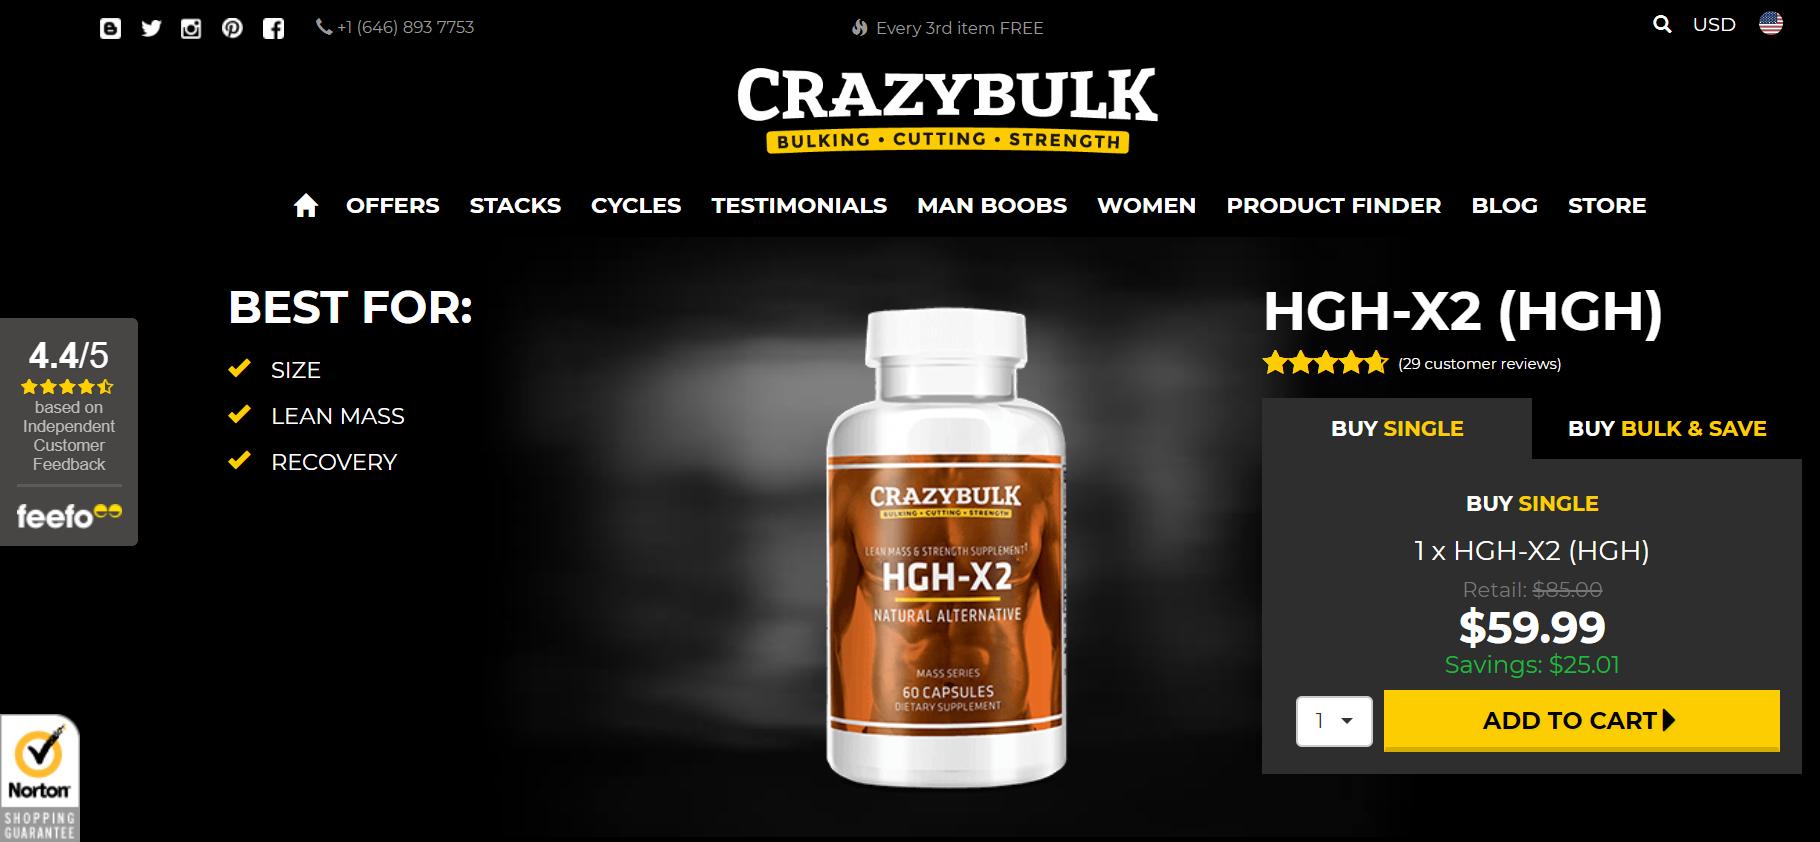 CrazyBulk HGH-X2 Official Website